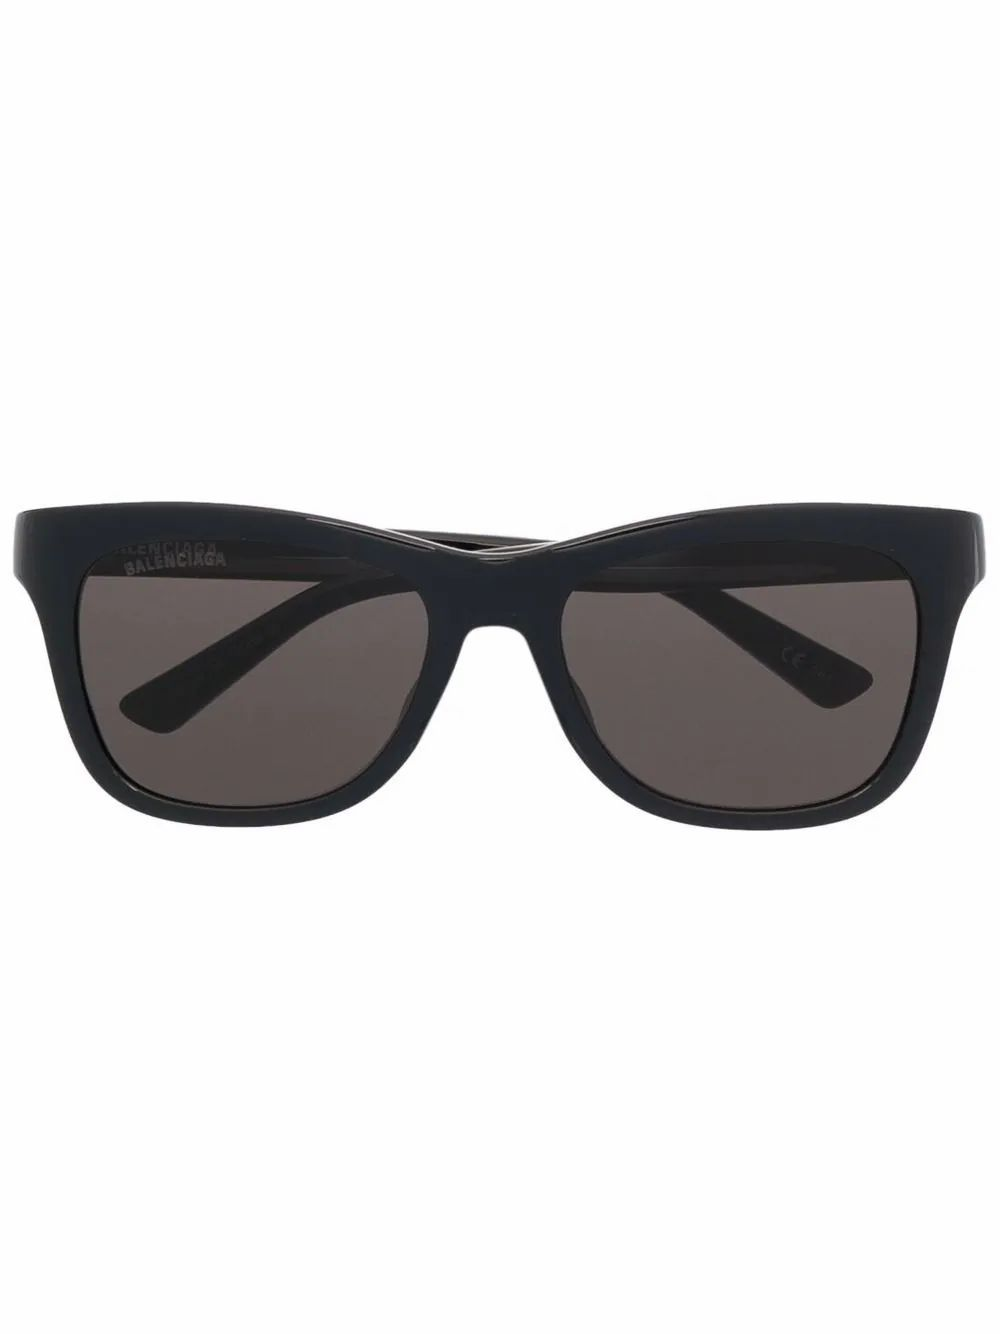 Balenciaga Men's Black Acetate Sunglasses